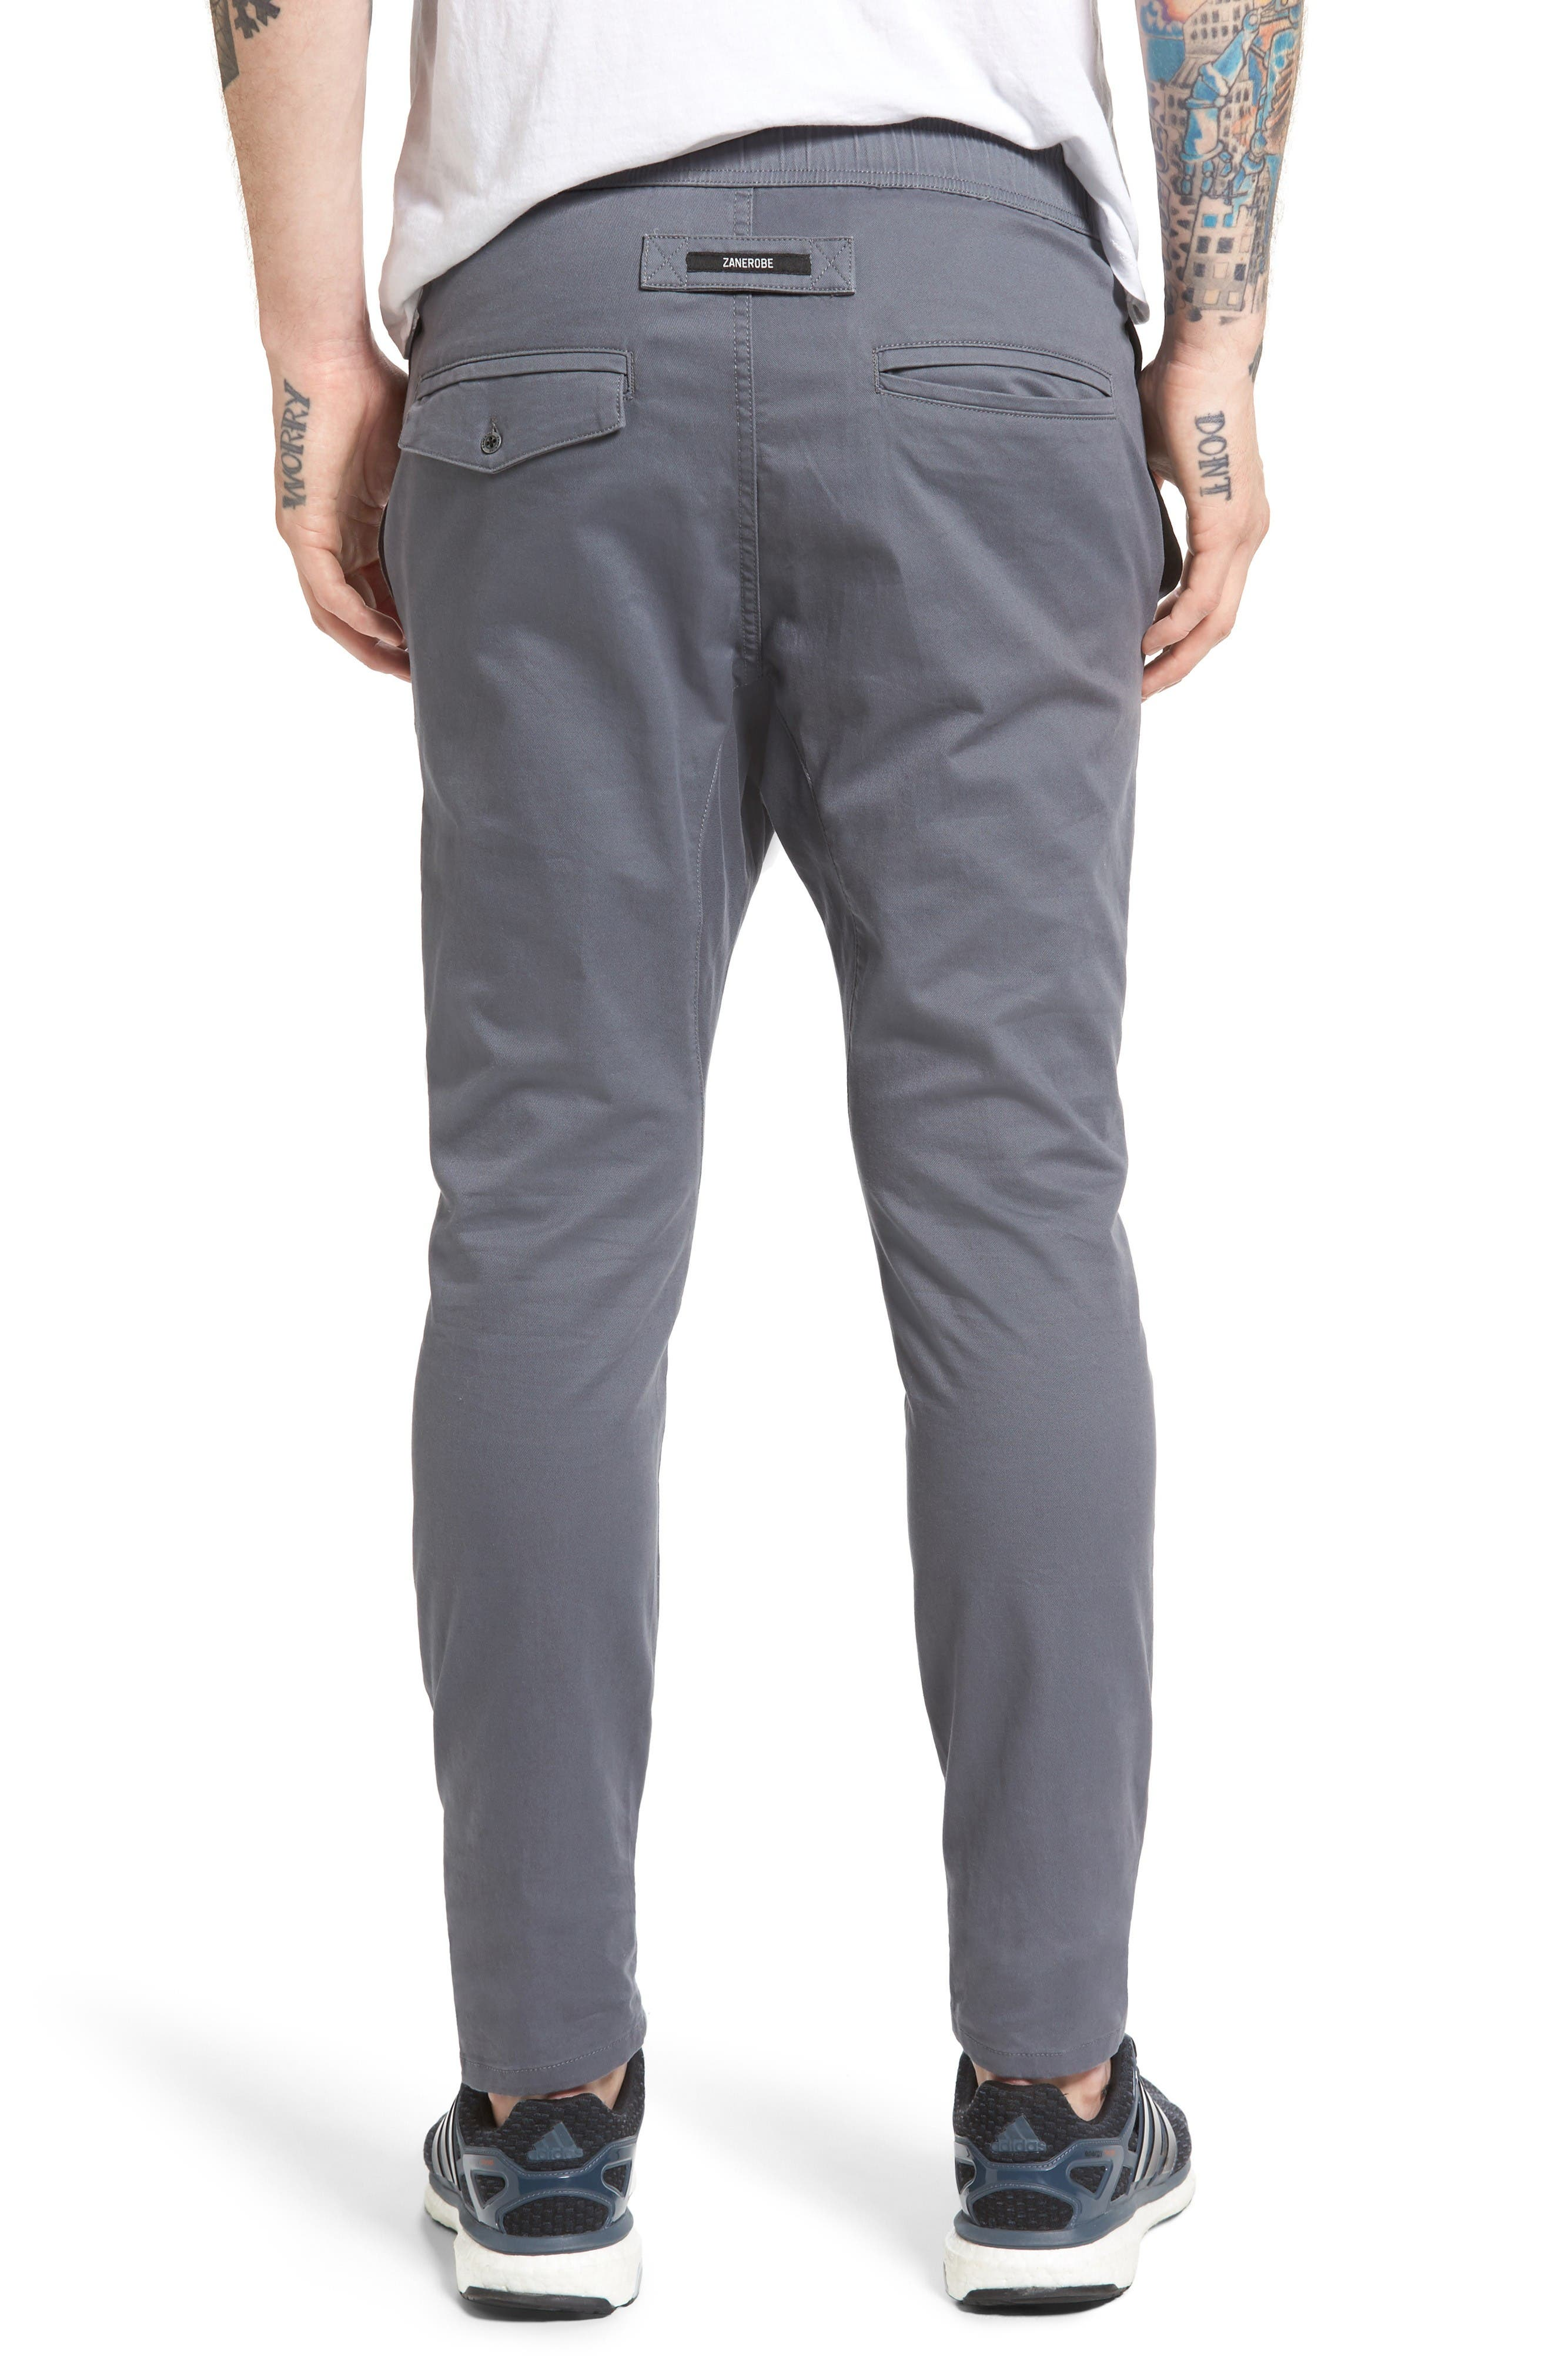 Salerno Stretch Woven Jogger Pants,                             Alternate thumbnail 2, color,                             Grey